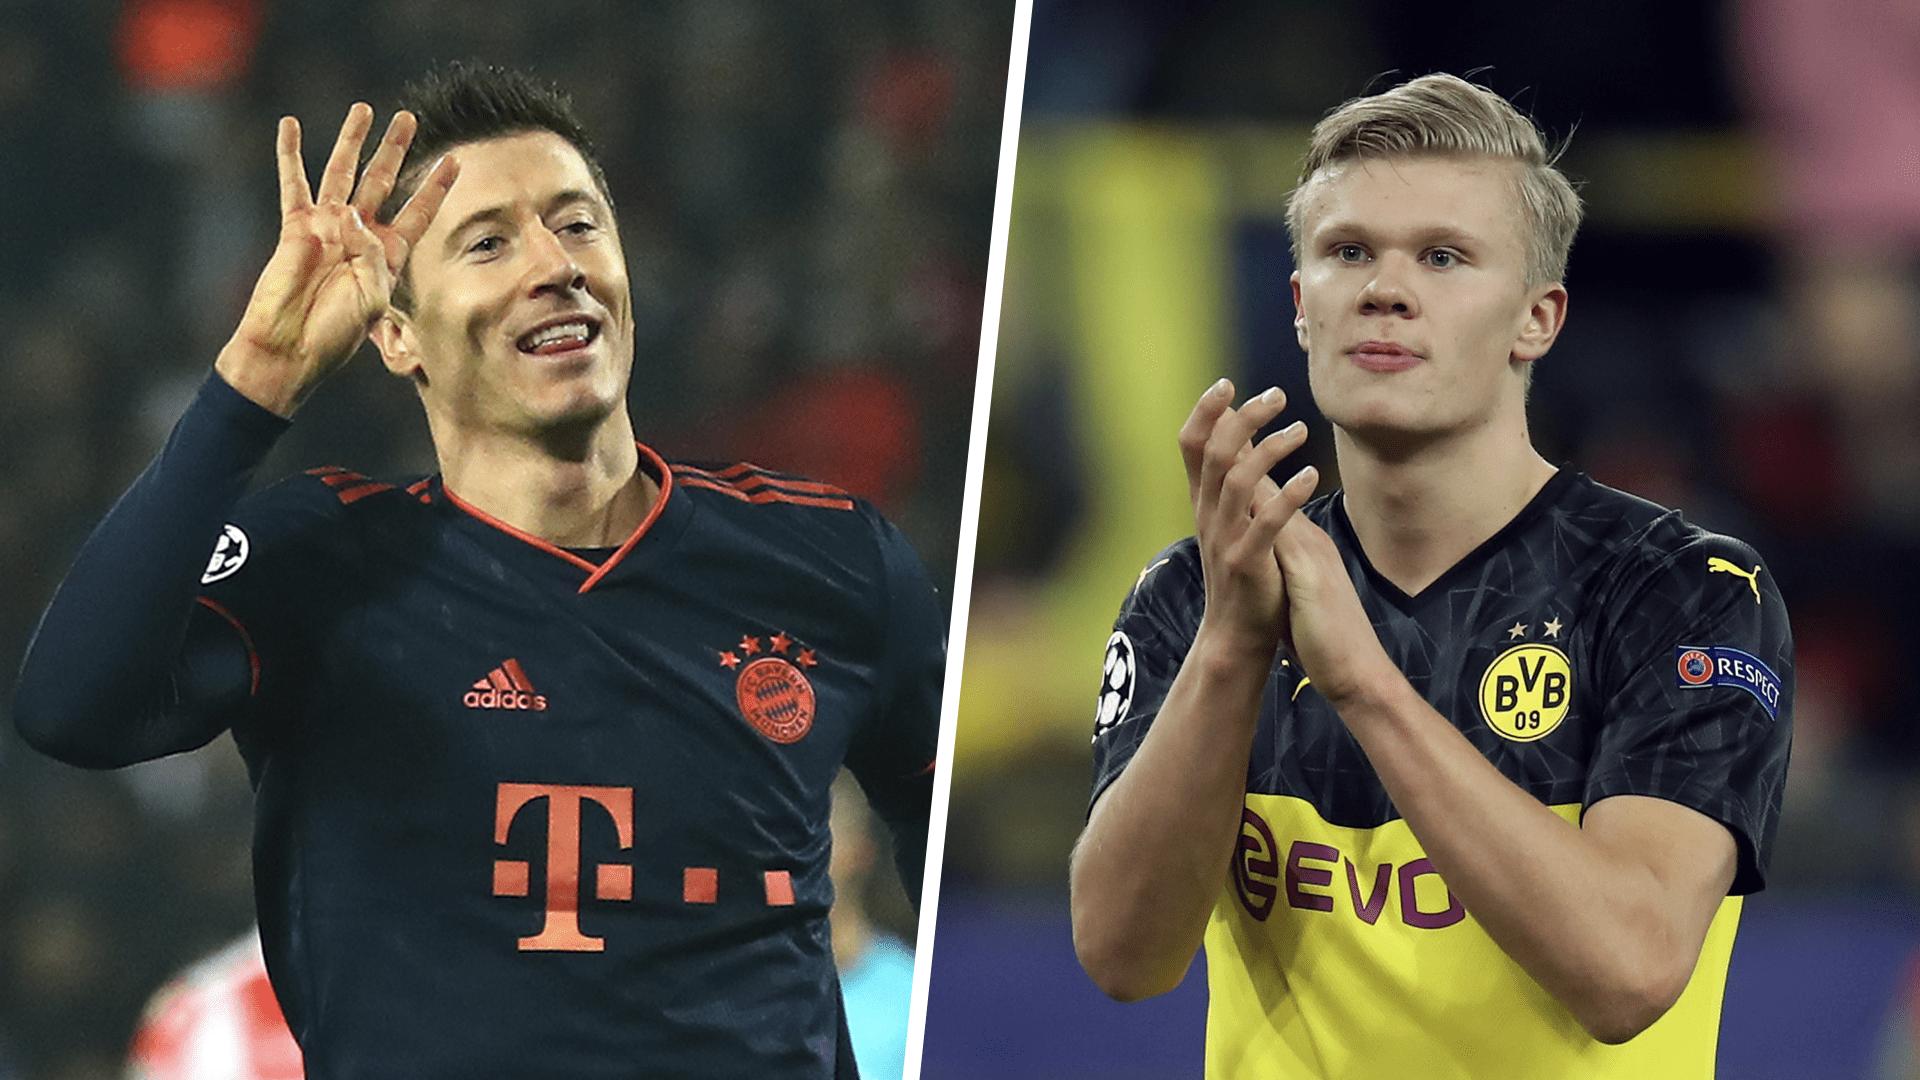 UEFA top scorers 2019-20: Haaland & Lewandowski lead the way